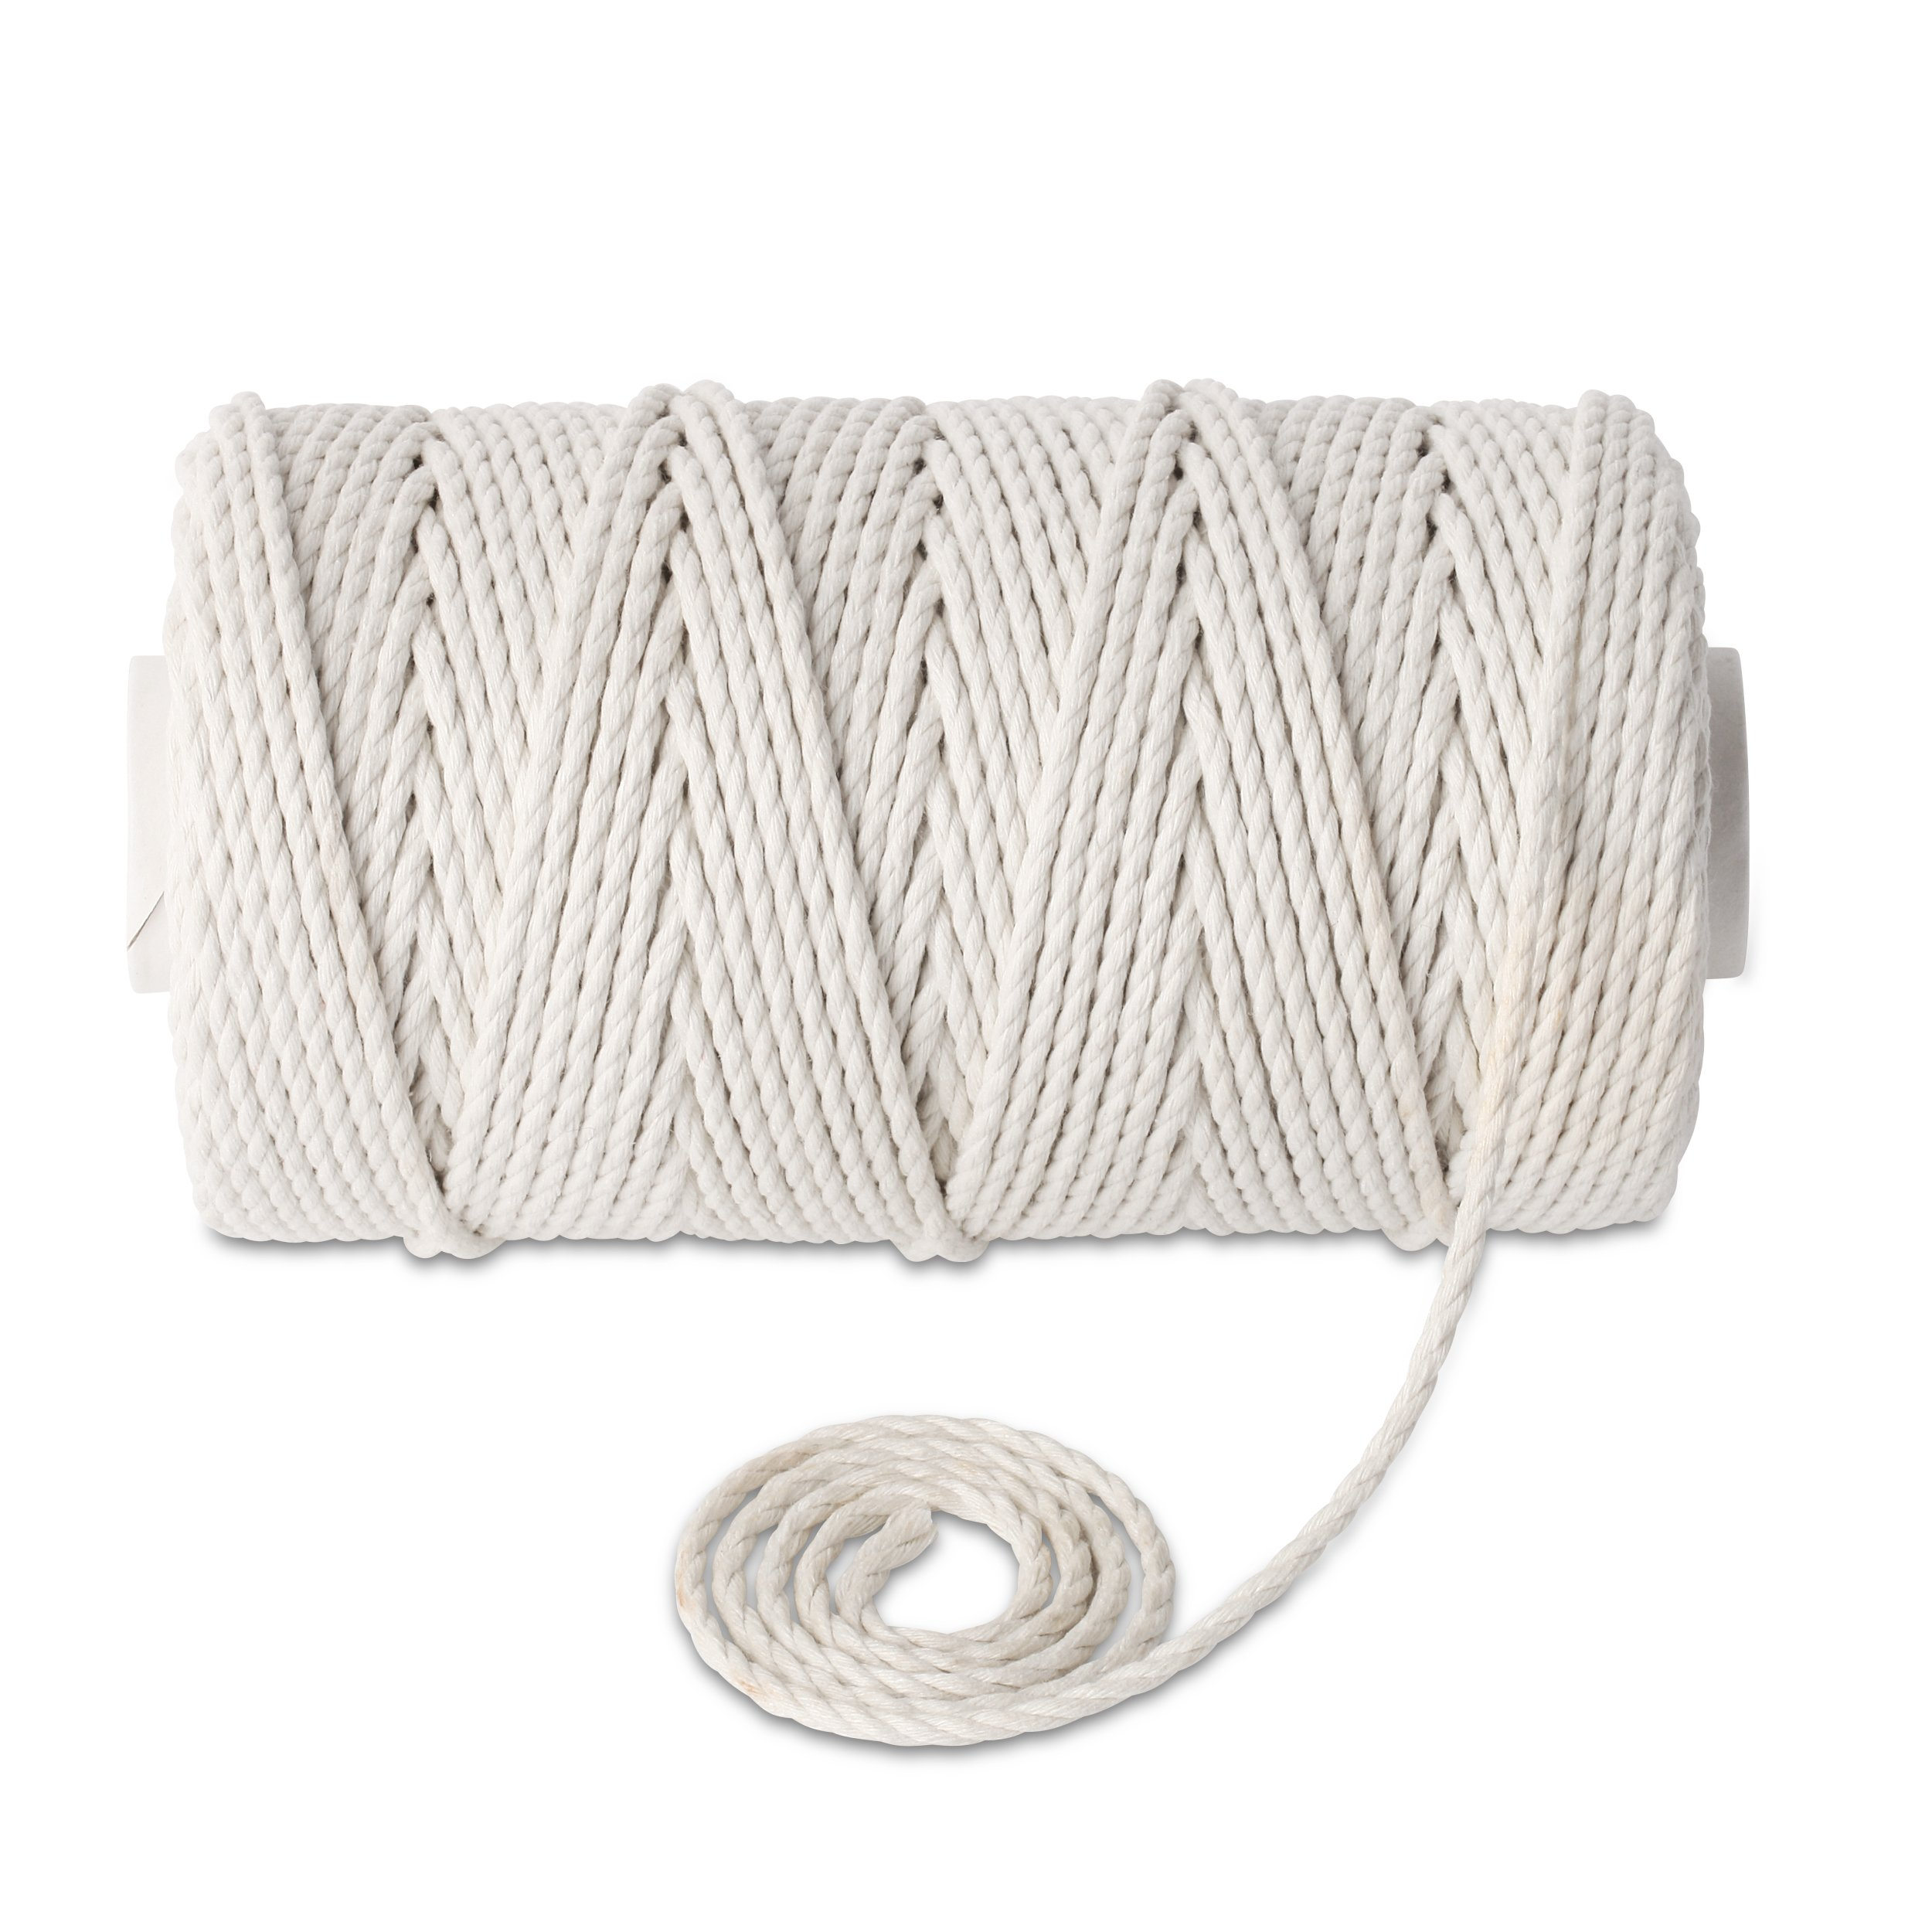 Stillness Crafts 4mm Macrame Cord - Best for Plant Hanger Wall Hanging Craft Making Dream Catchers Macrame Supplies Natural Cotton Yarn Macrame Rope